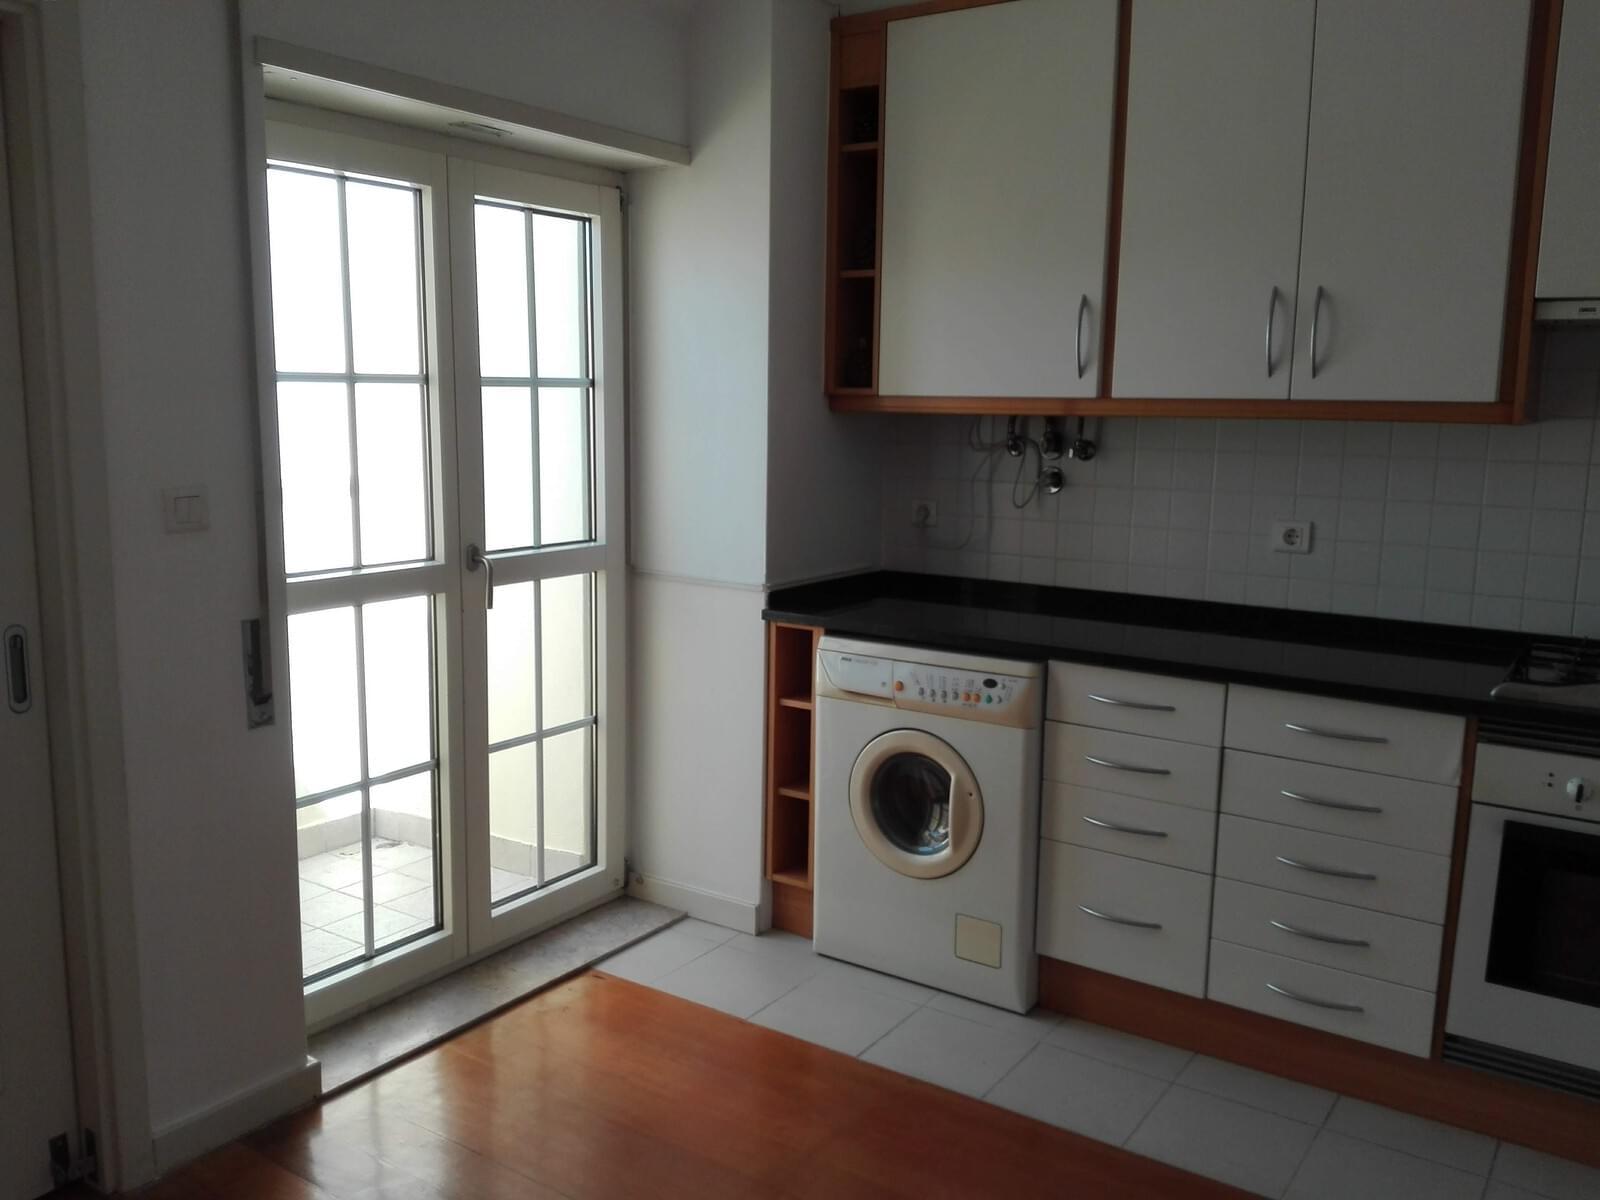 pf17908-apartamento-t1-lisboa-51003091-82a2-4e54-ade2-696a4e3a3e2f